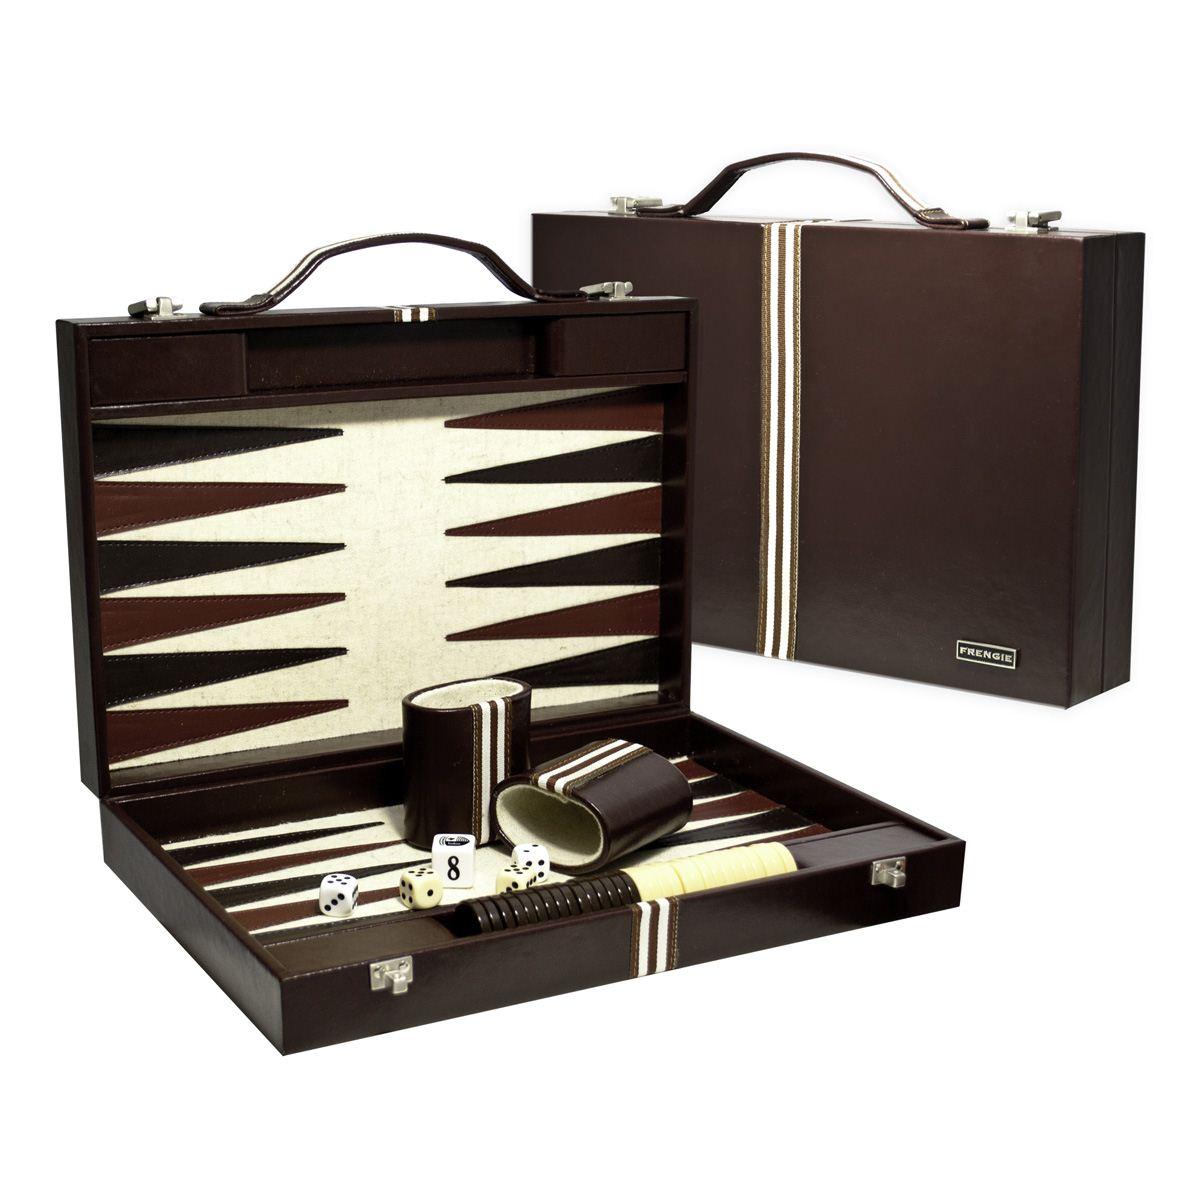 Backgammon interiores en paño